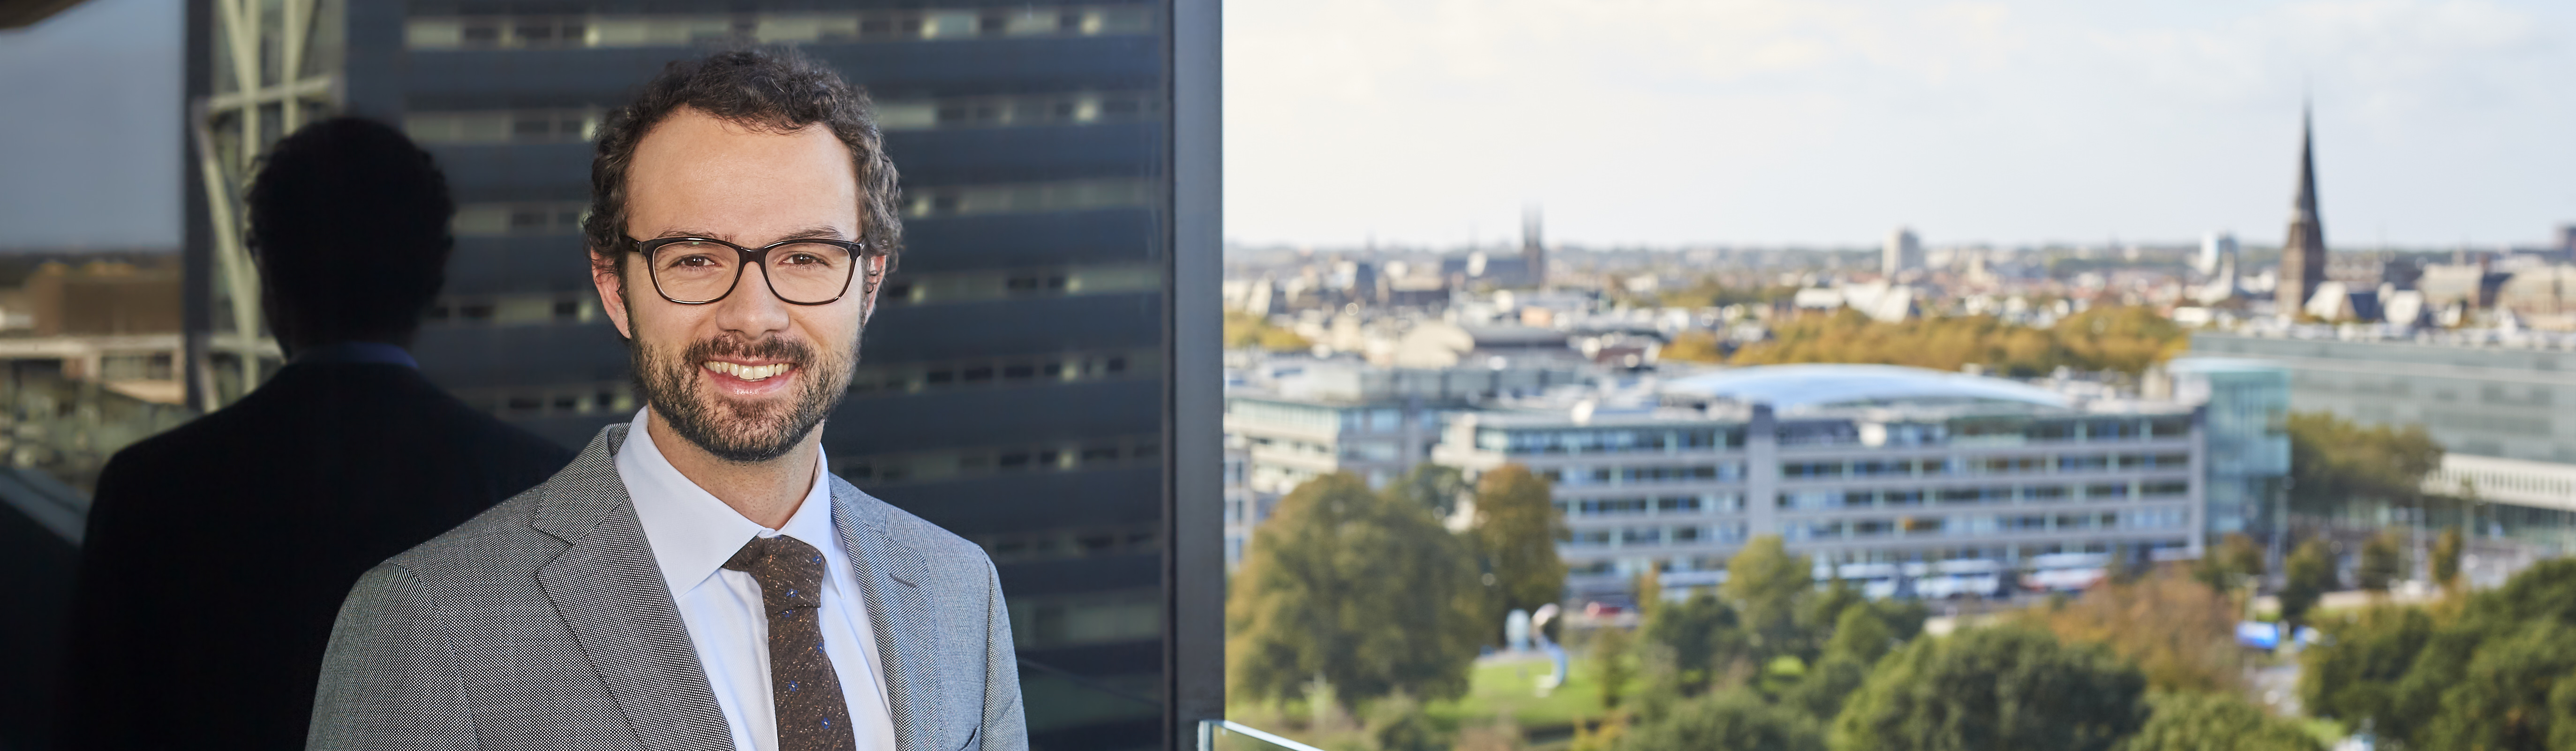 Derek Tersmette, advocaat Pels Rijcken